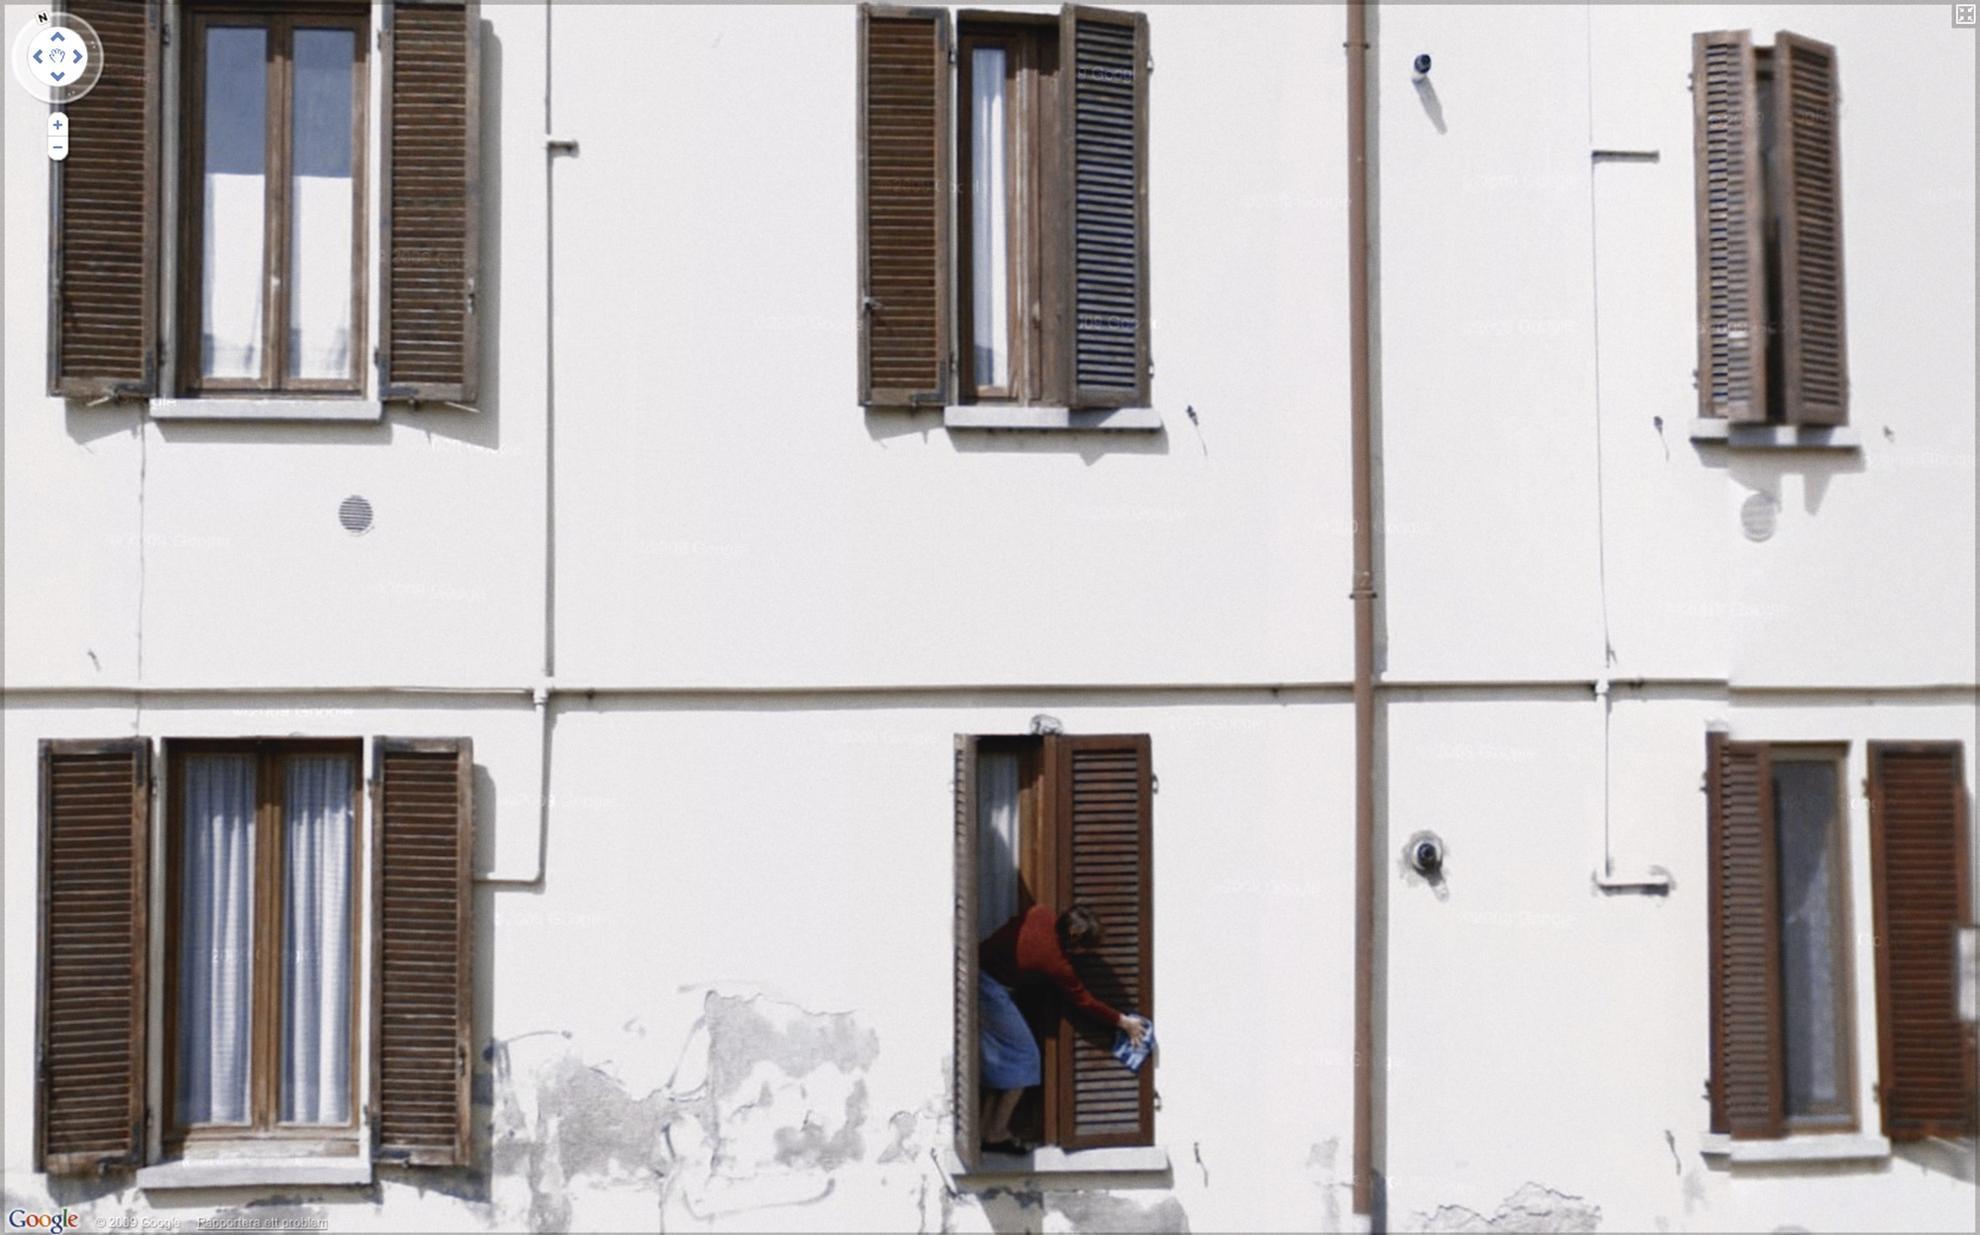 Jon Rafman-Via Colombo, Mediglia, Lombardy, Italy - Google View-2009